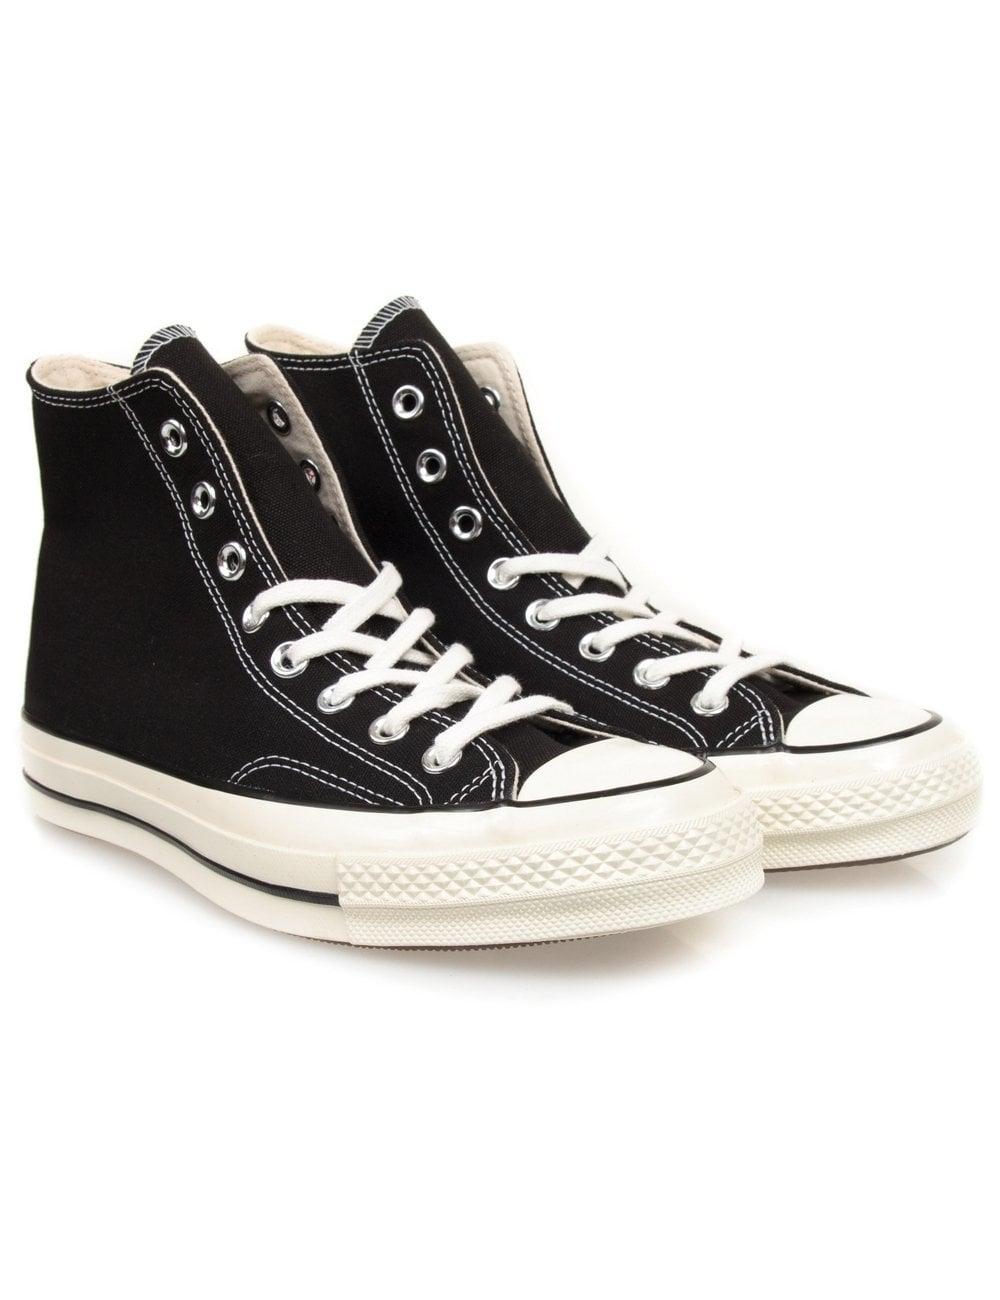 converse chuck taylor 70s black